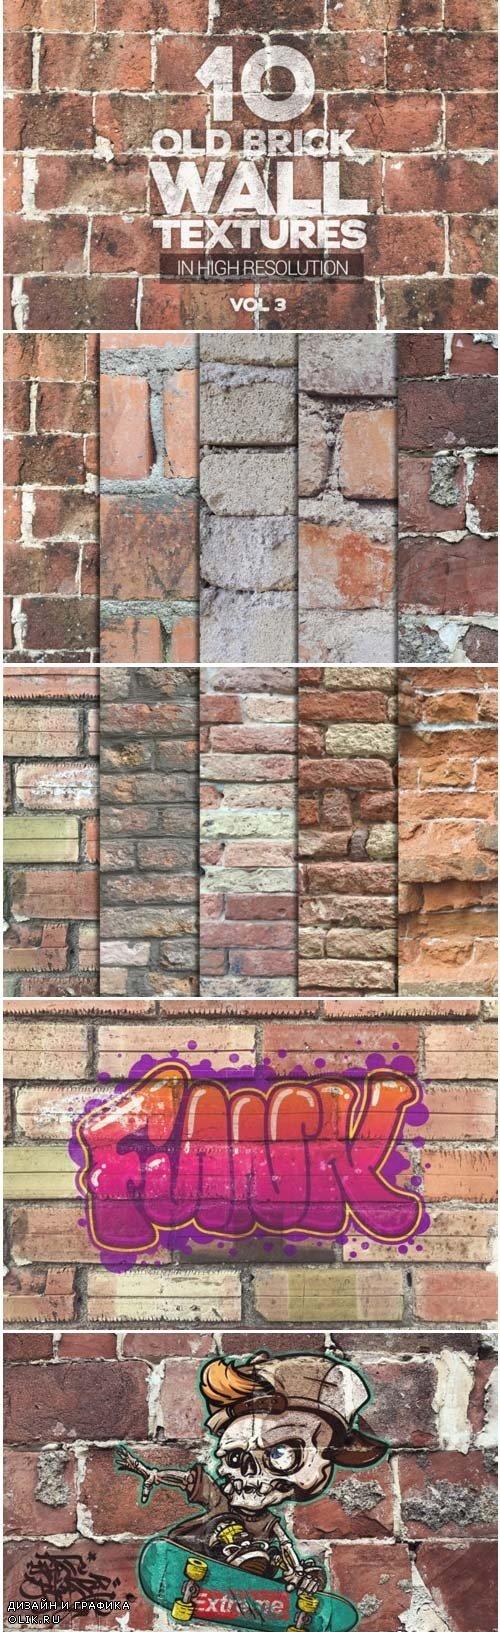 Old Brick Wall Textures Vol 3 x10 3976506